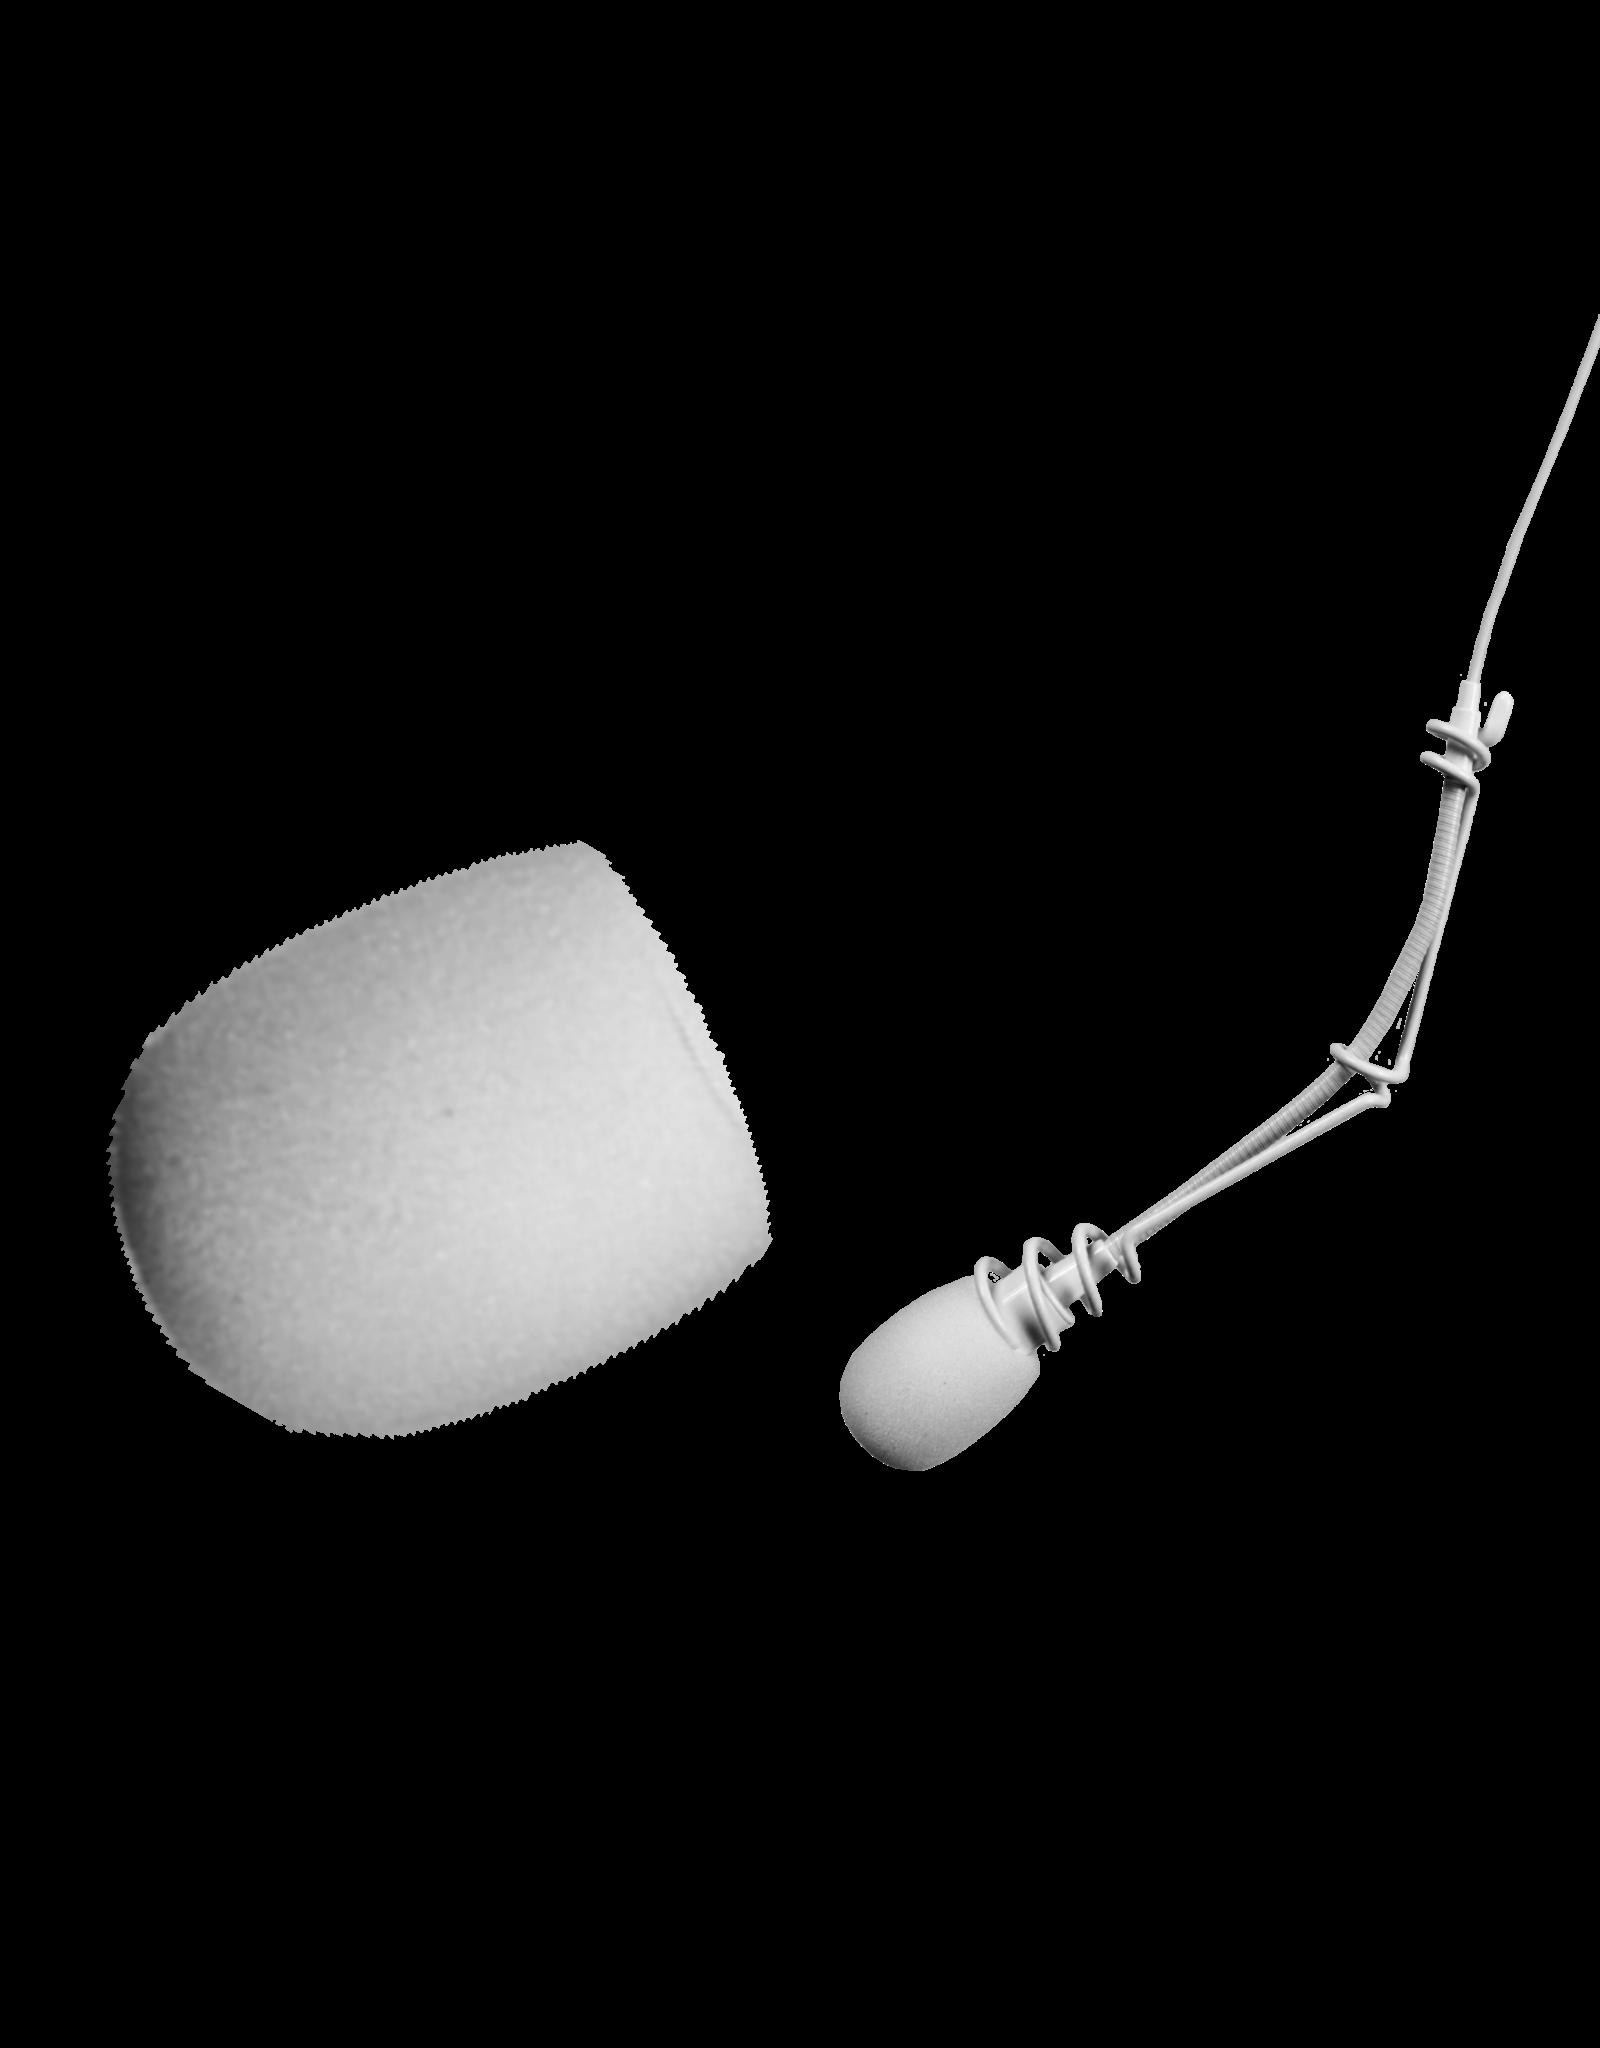 Audac CMX380 windscreen White